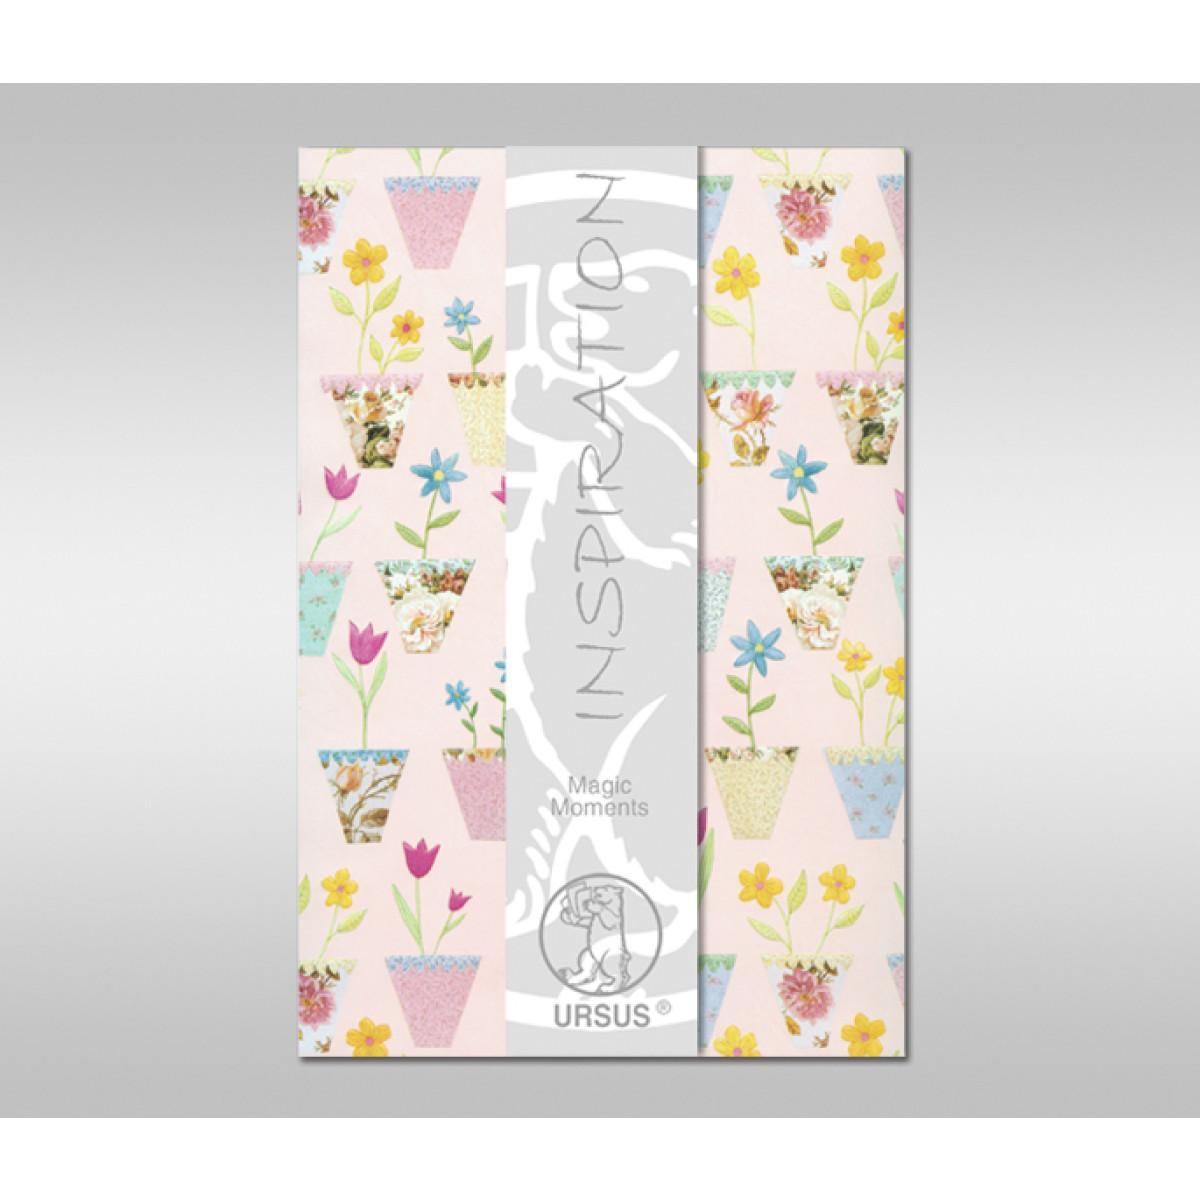 "Magic Moments ""Summertime"" 120 g/qm 45 x 69 cm - 1 Bogen"